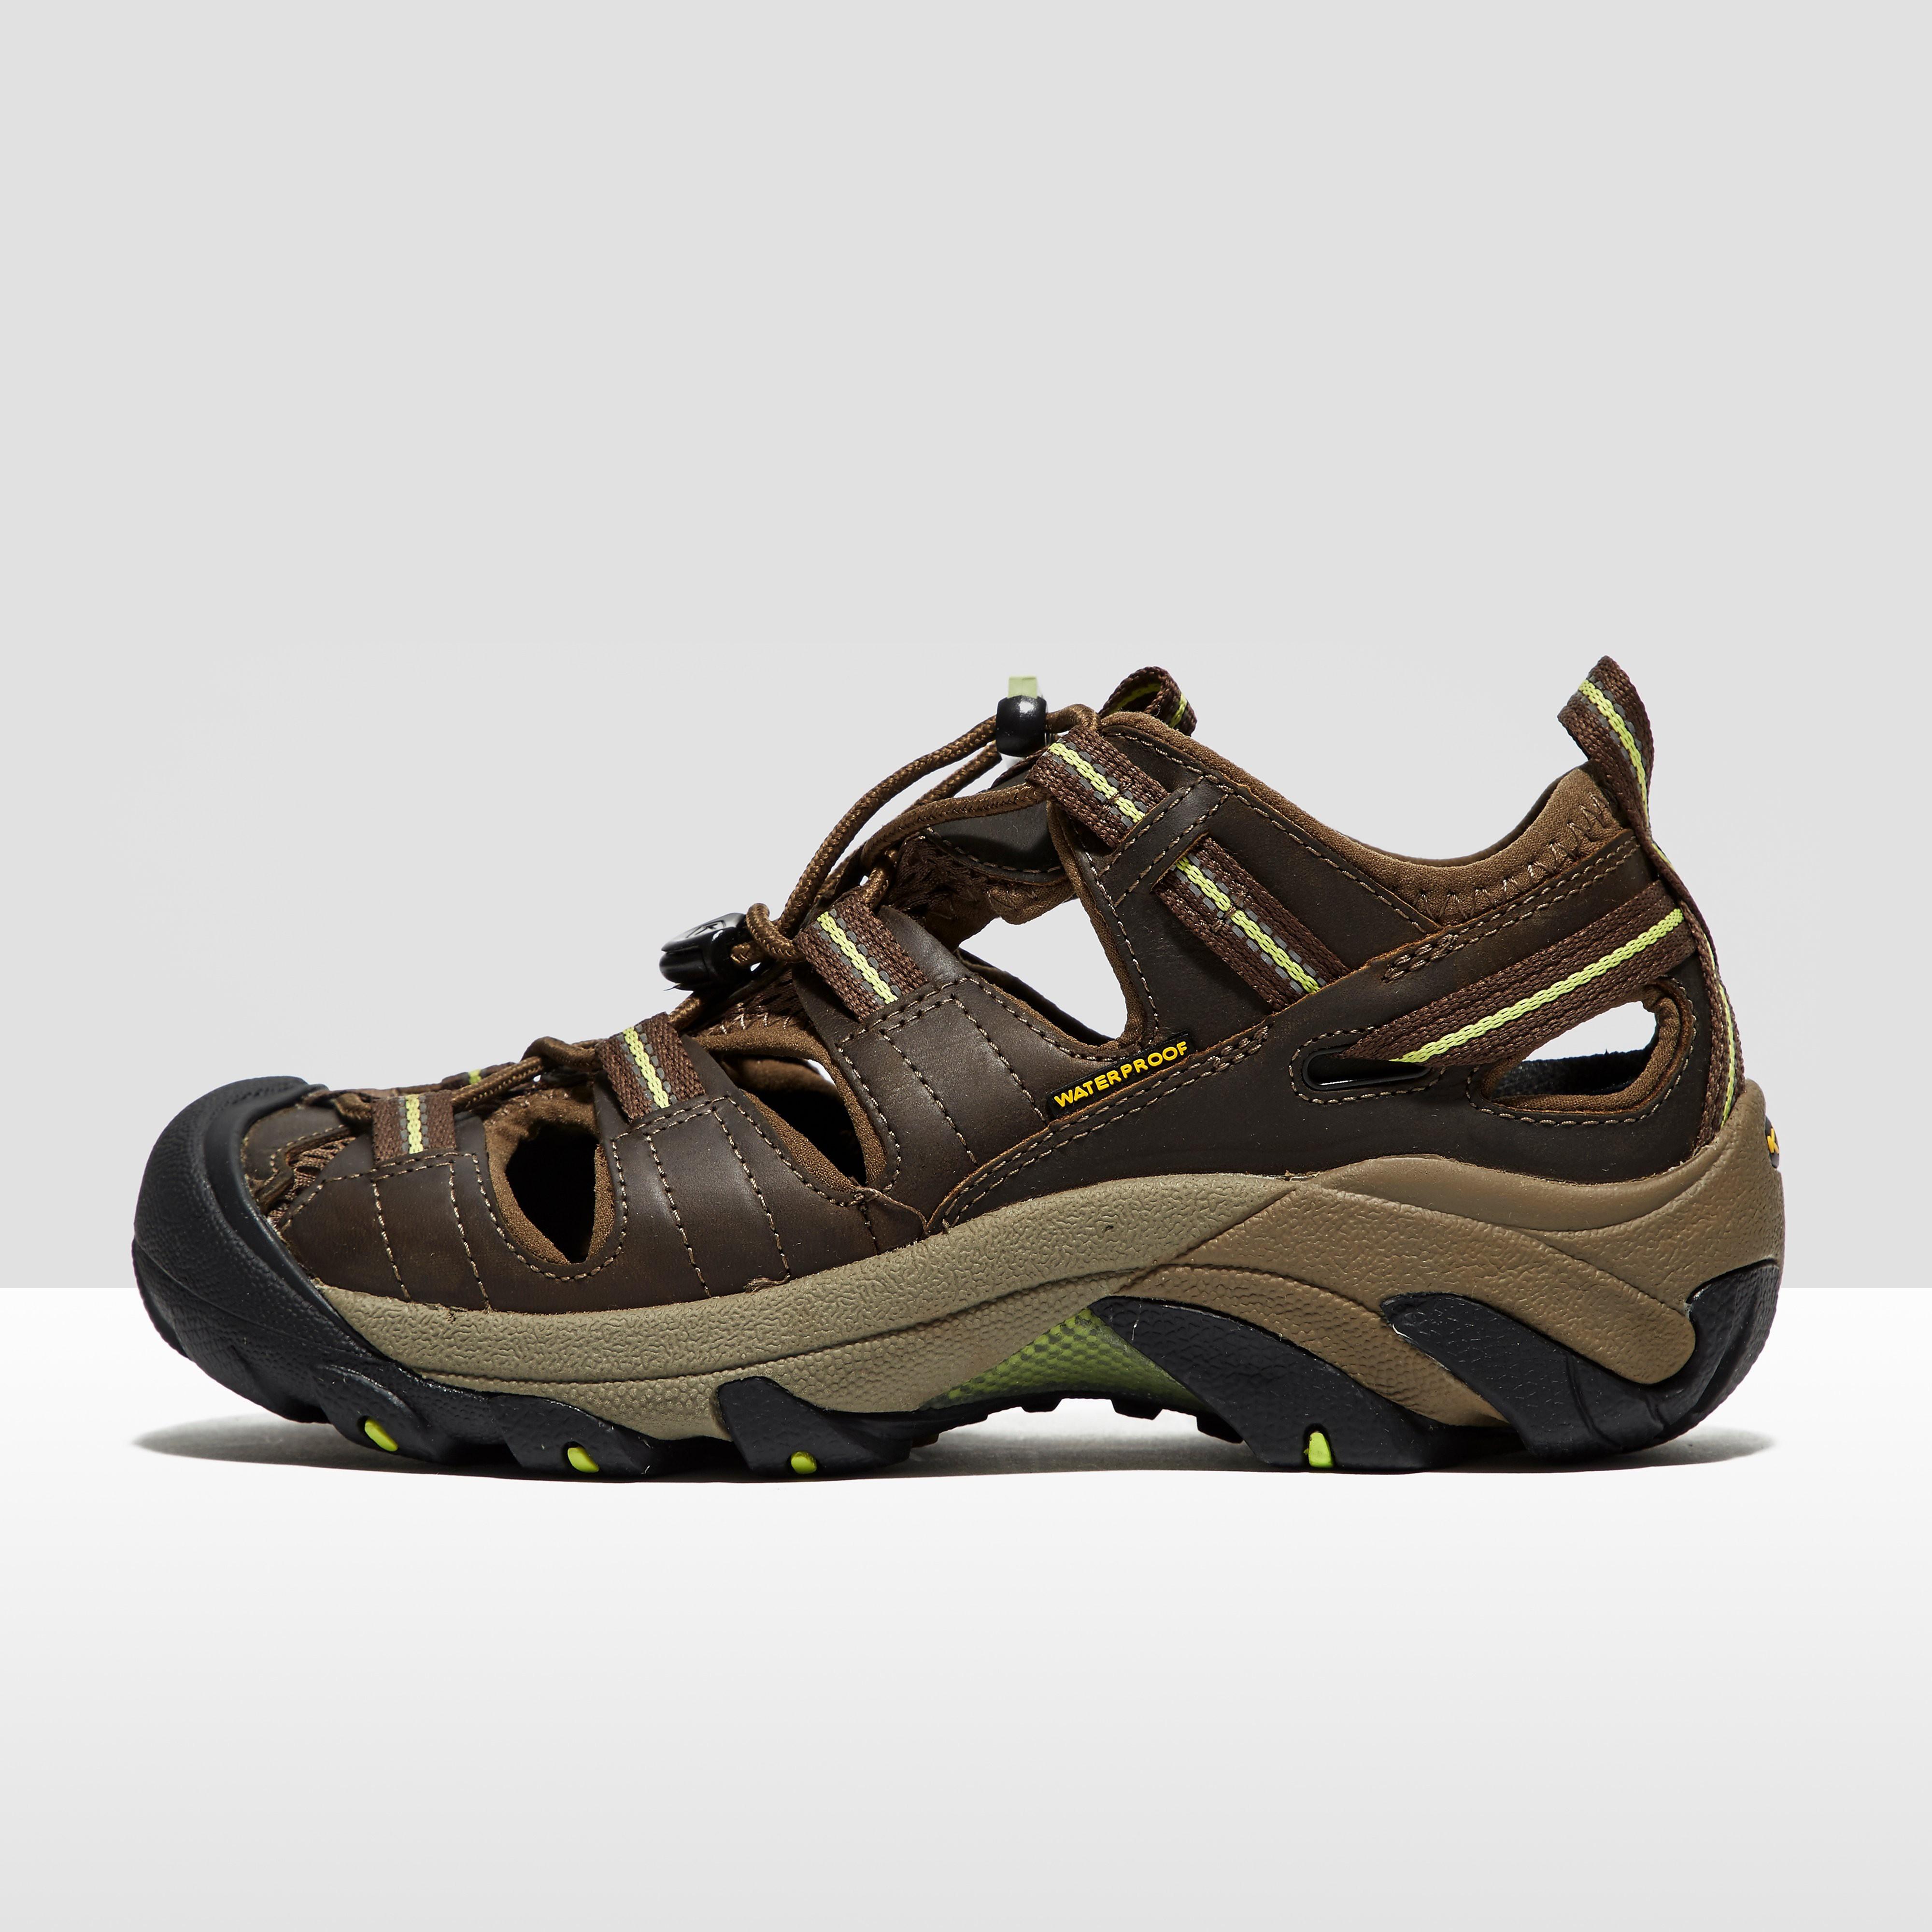 Keen Arroyo II Women's Walking Sandals